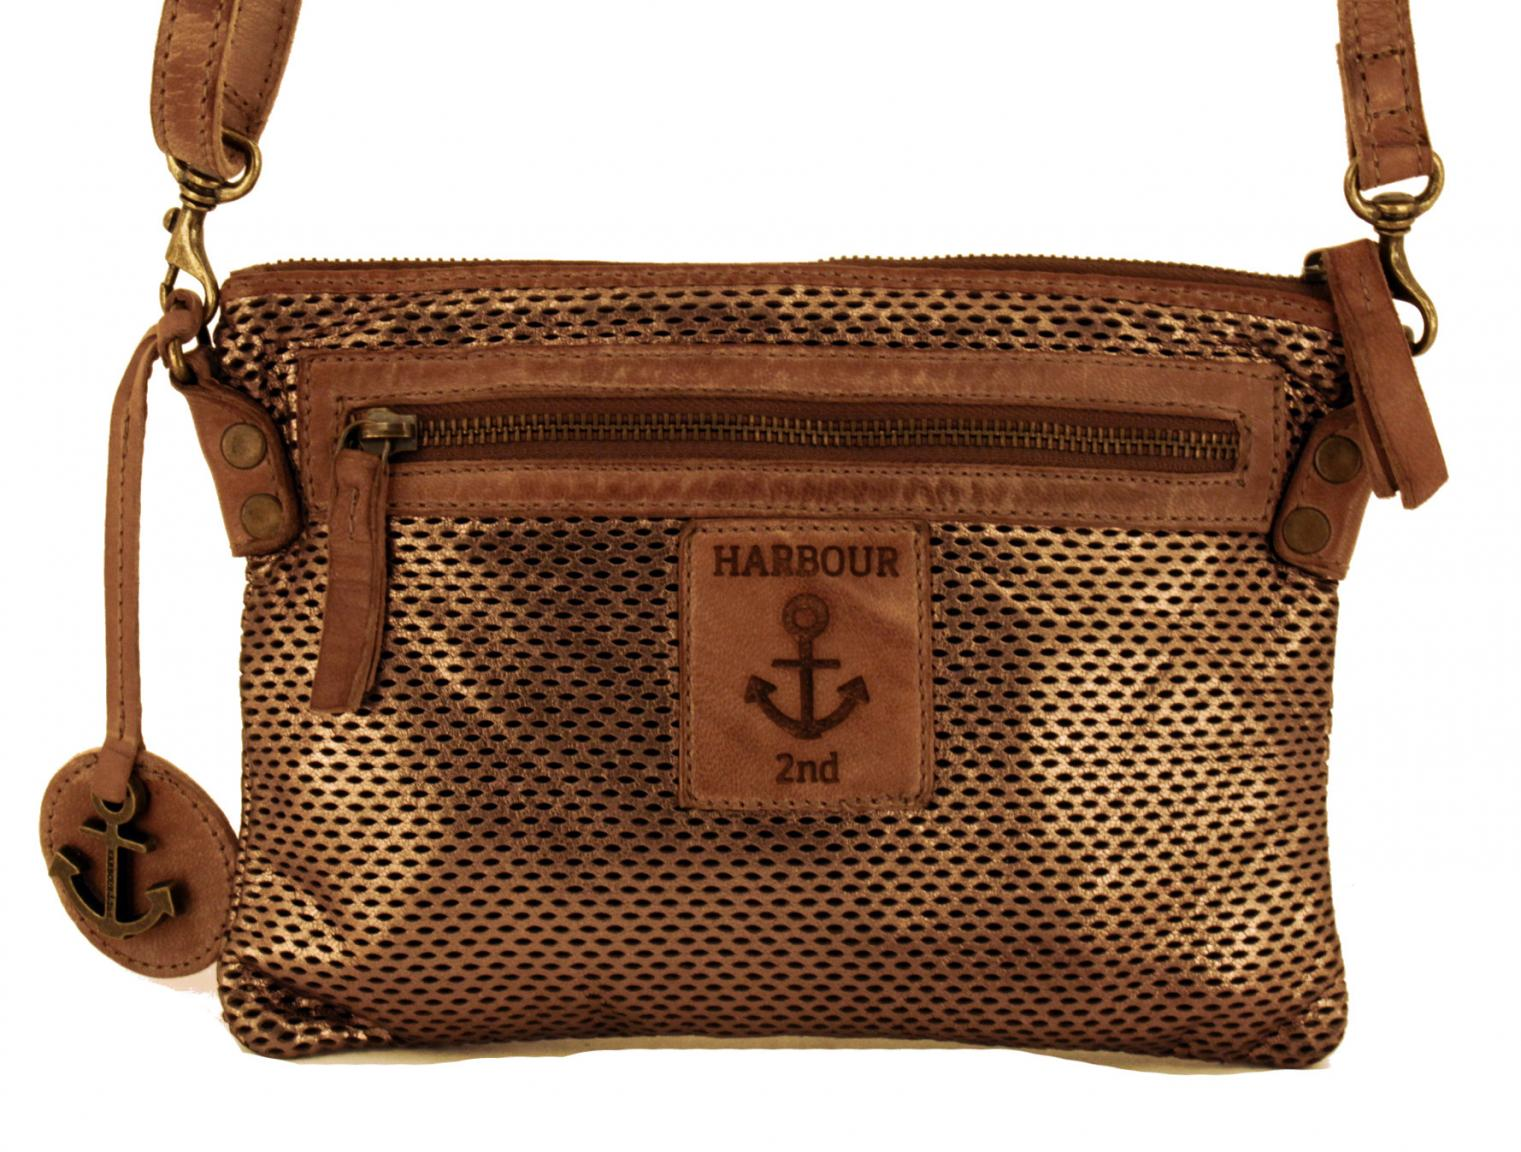 Harbour2nd Umhängetasche m-Jana Leder Zip silver